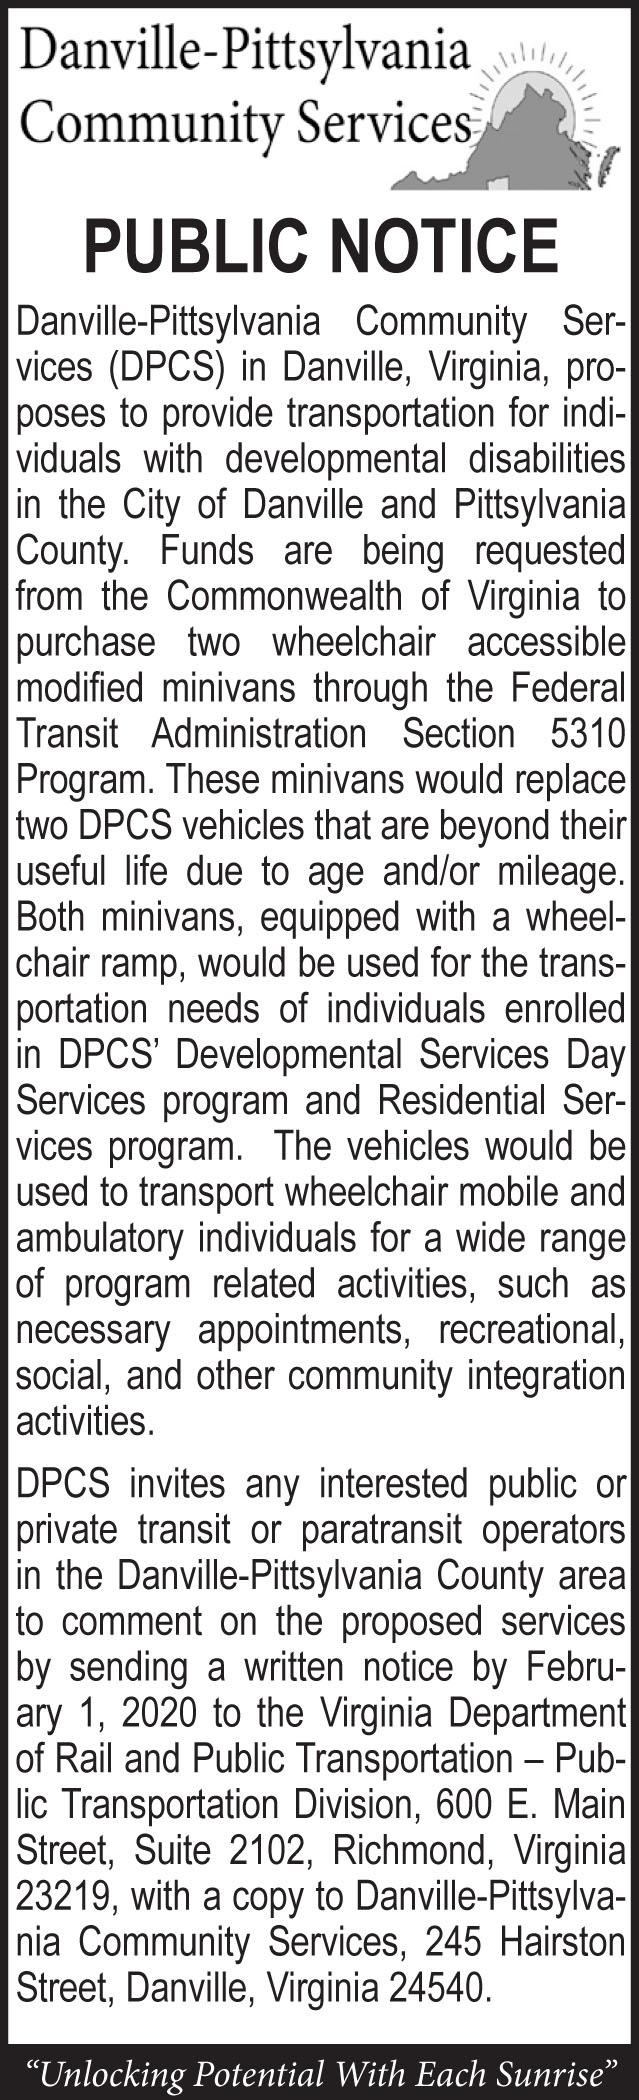 Danville-Pittsylvania Community Services Public Notice